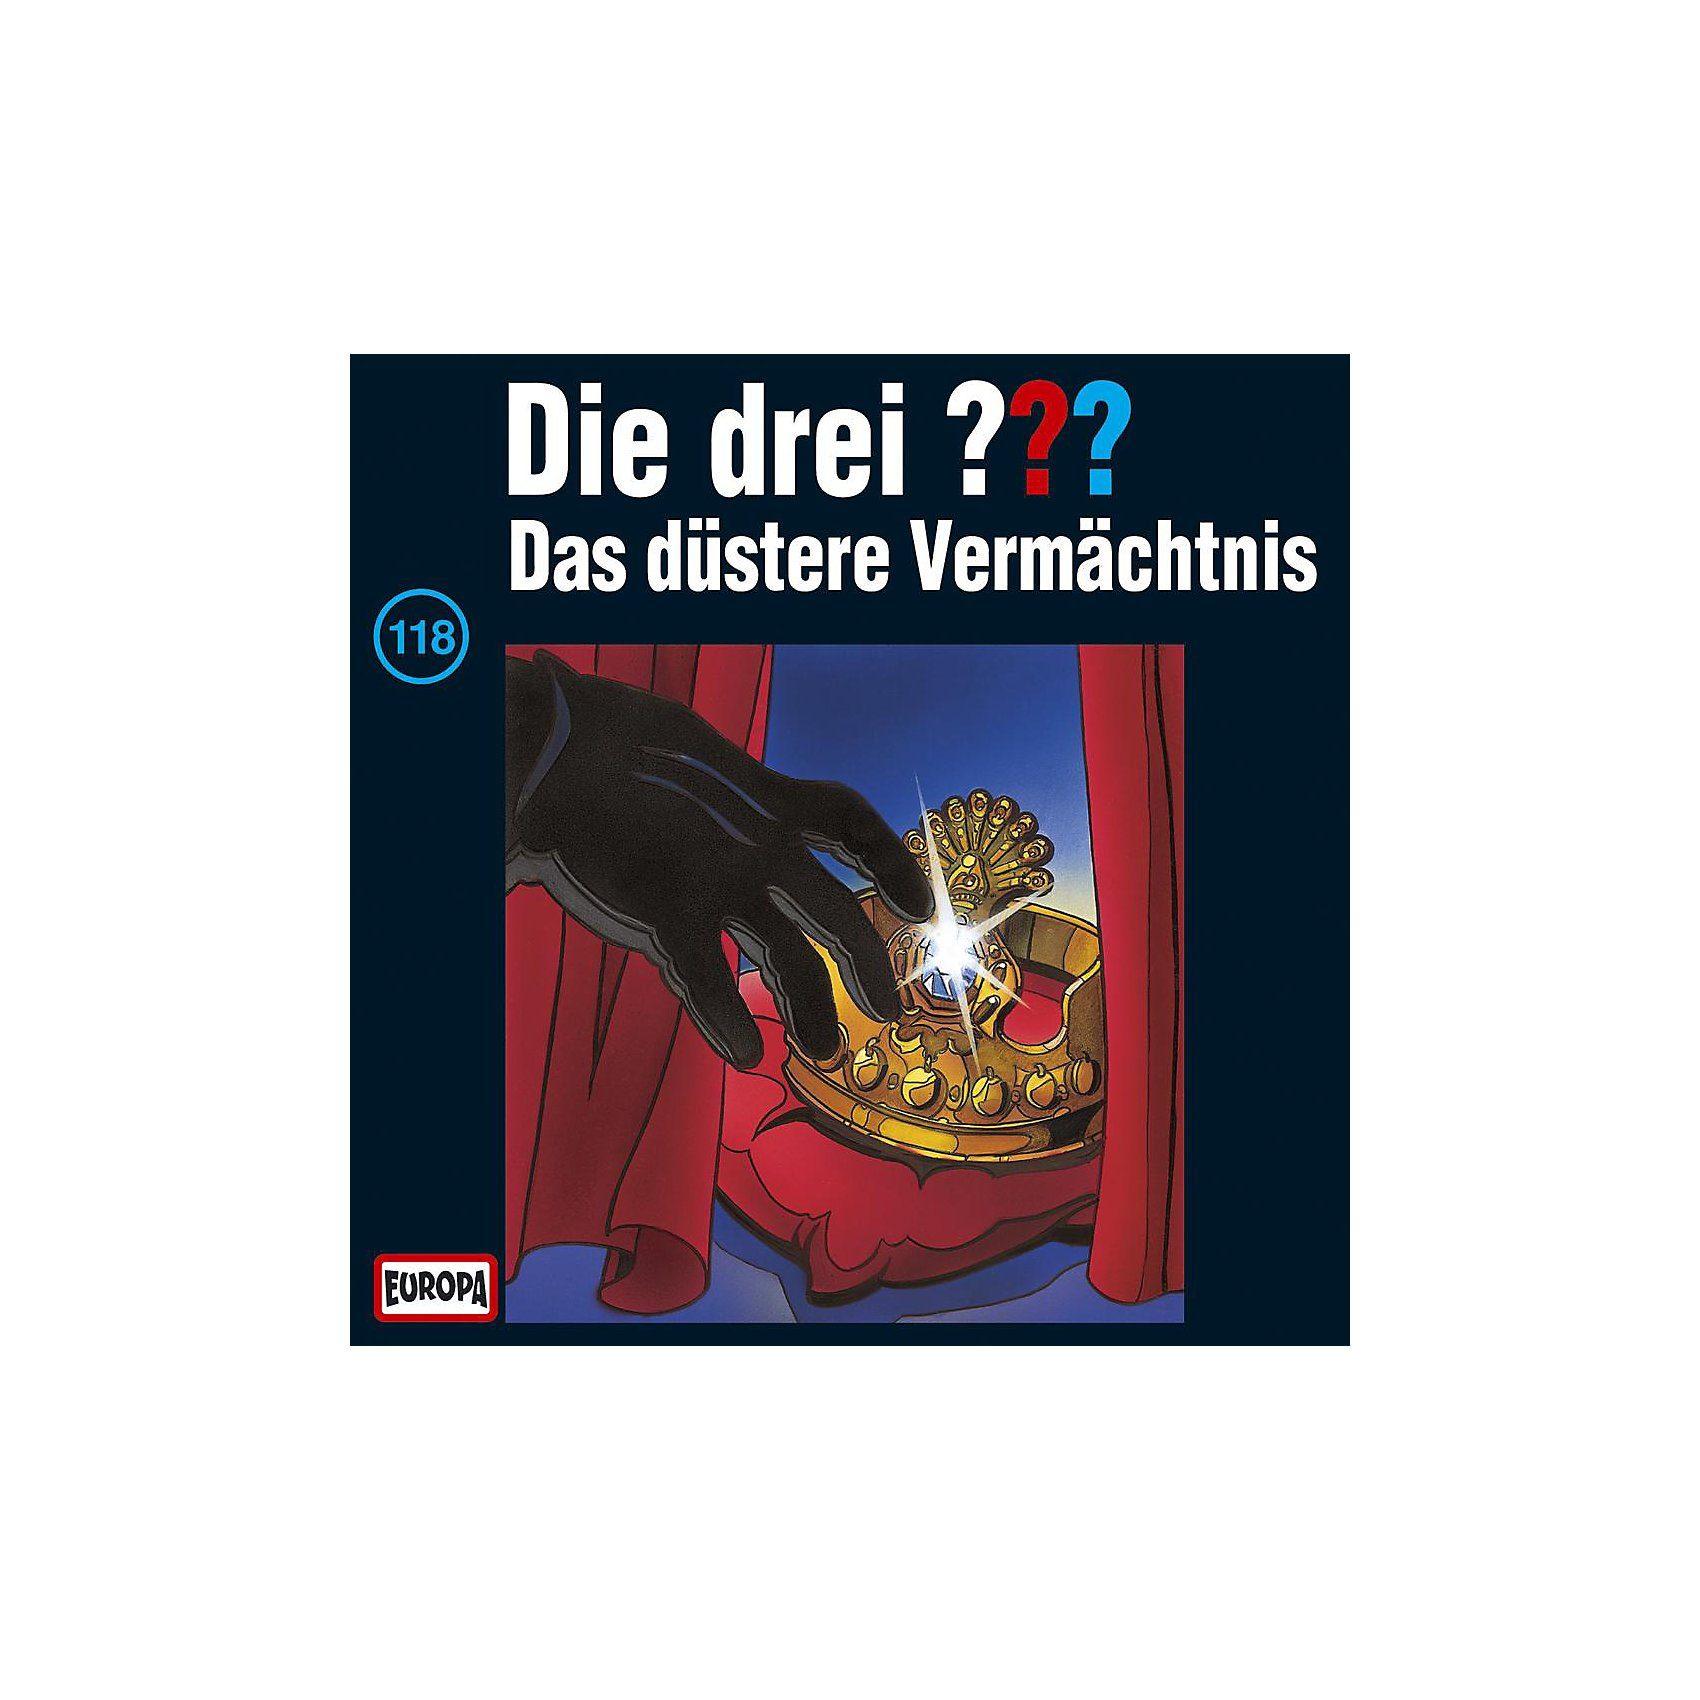 Sony CD Die Drei ??? 118 (Das düste)